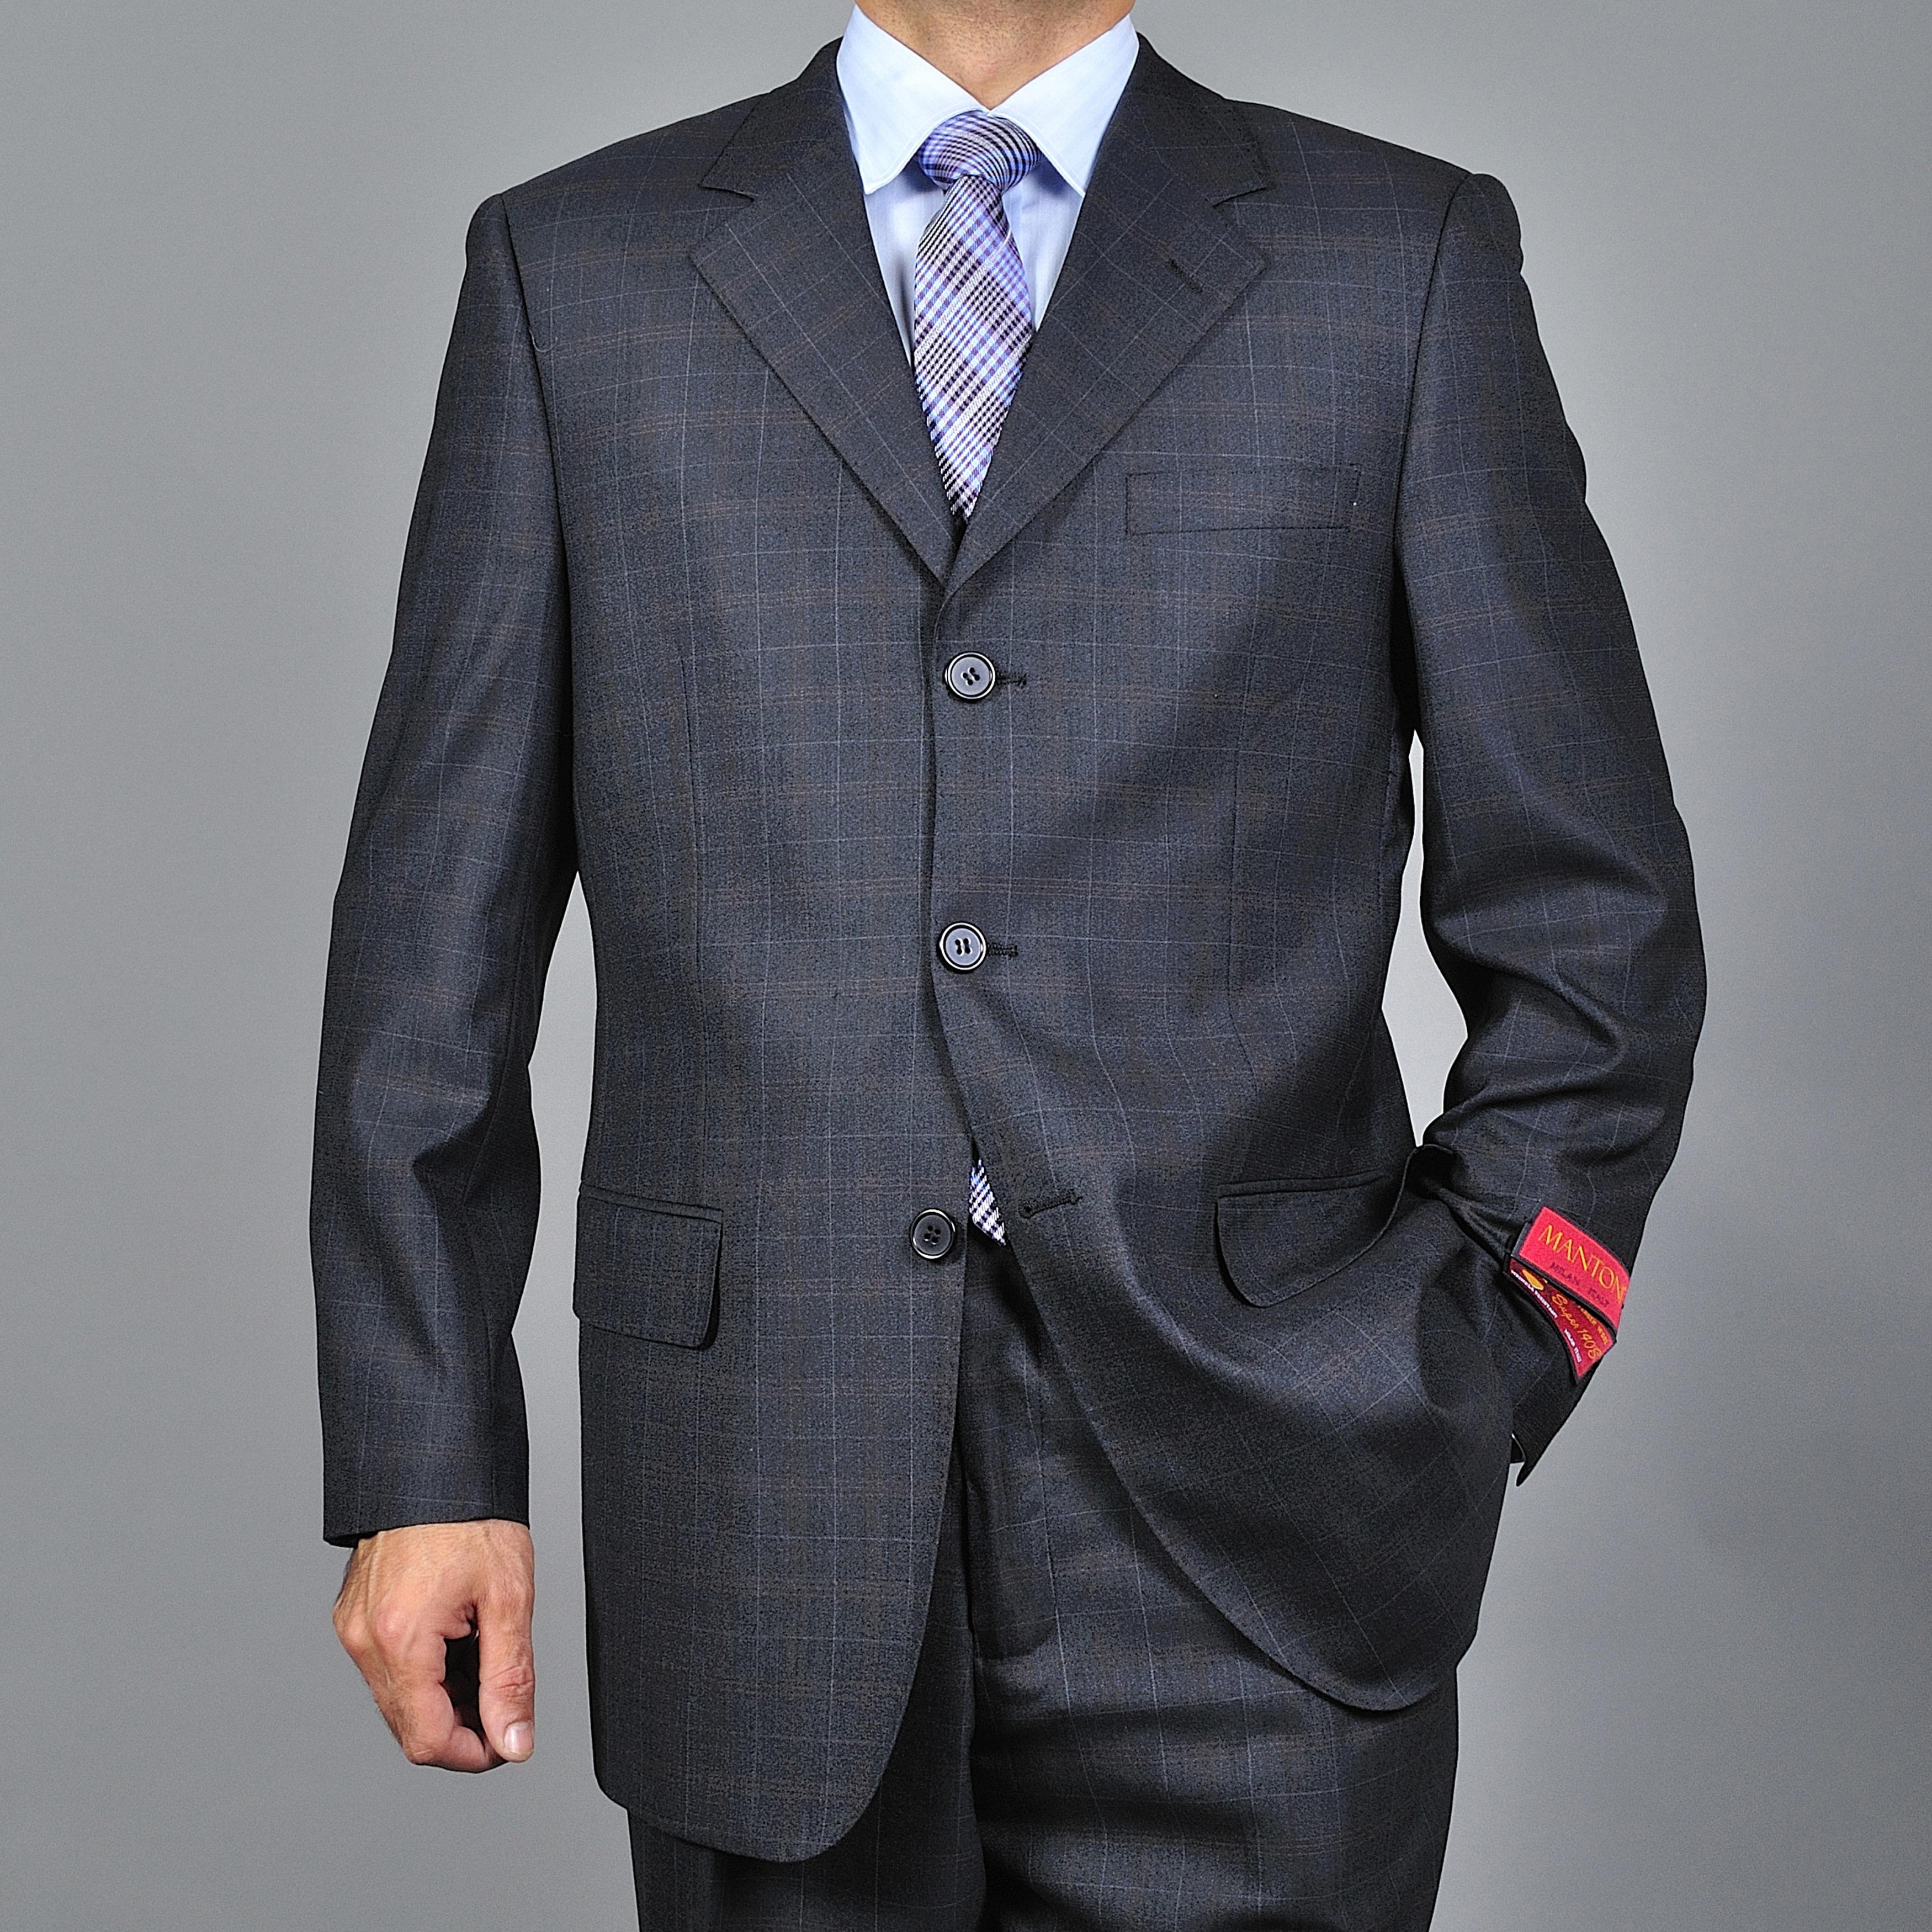 Men's Charcoal Windowpane Grey 3-button Wool Suit